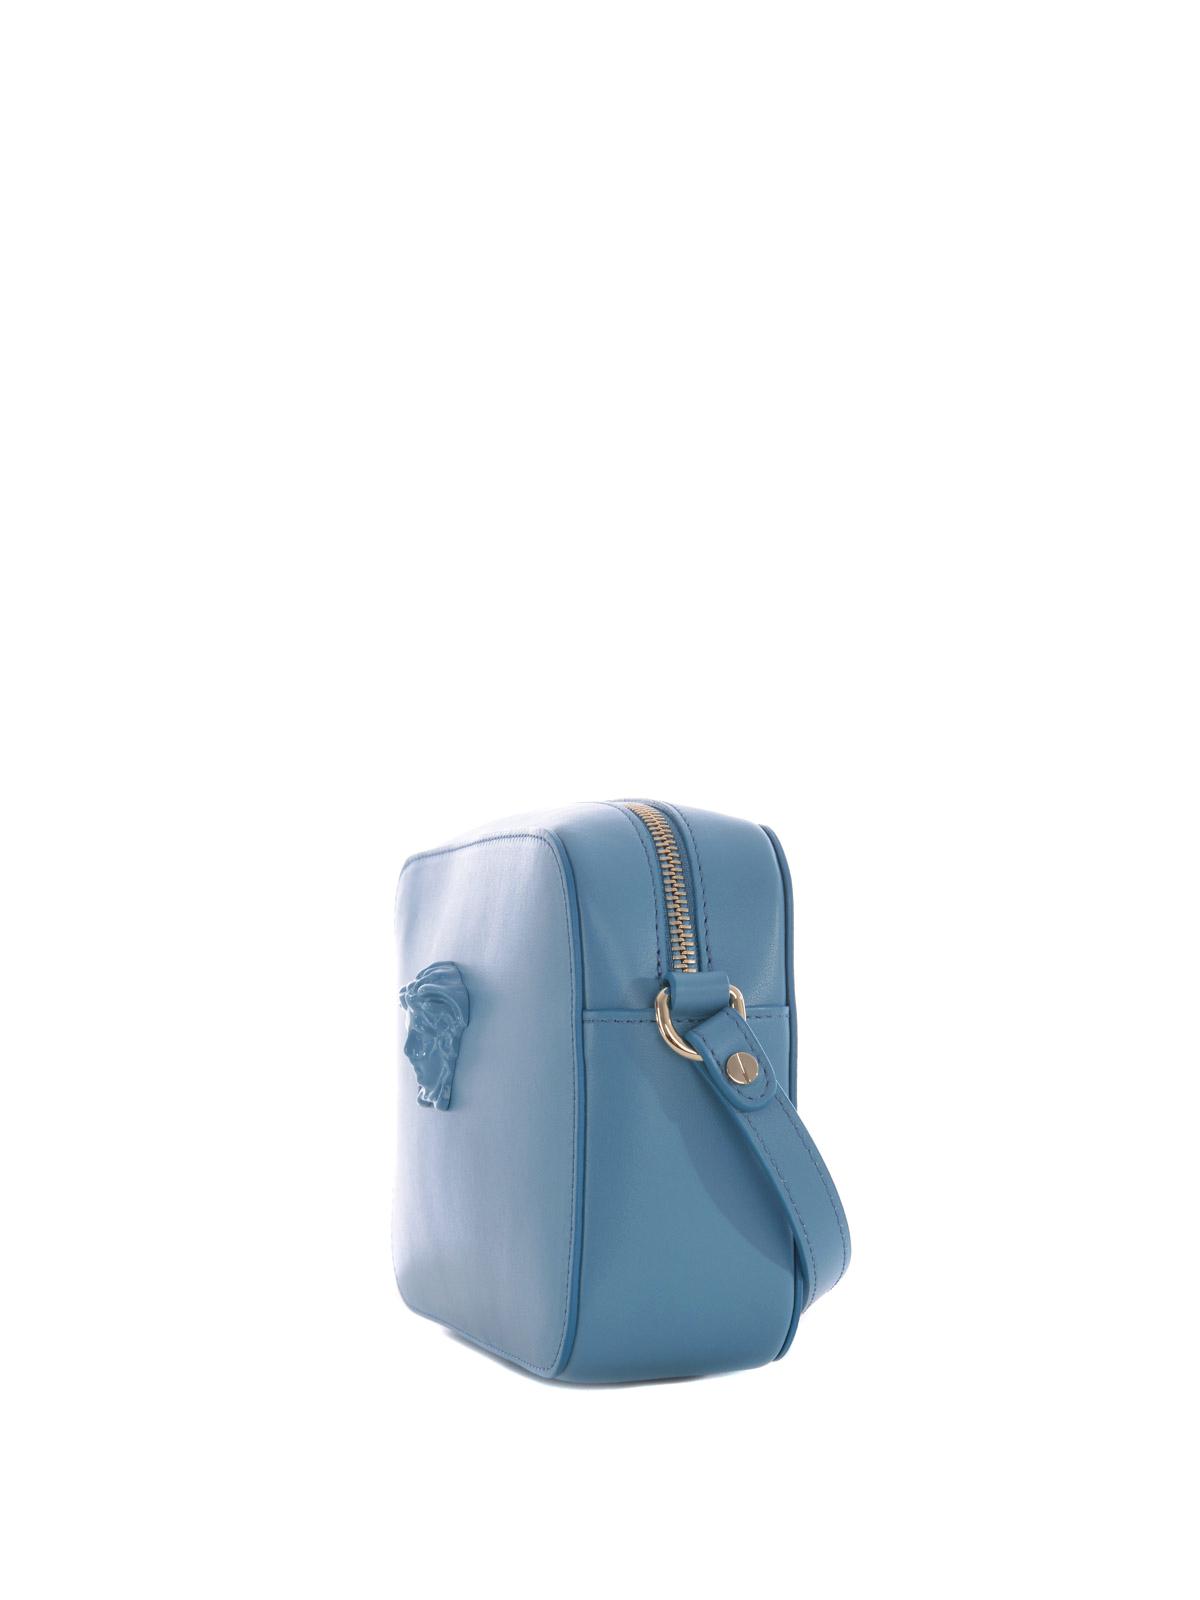 b67b9c1713 VERSACE  cross body bags online - Medusa Palazzo blue crossbody